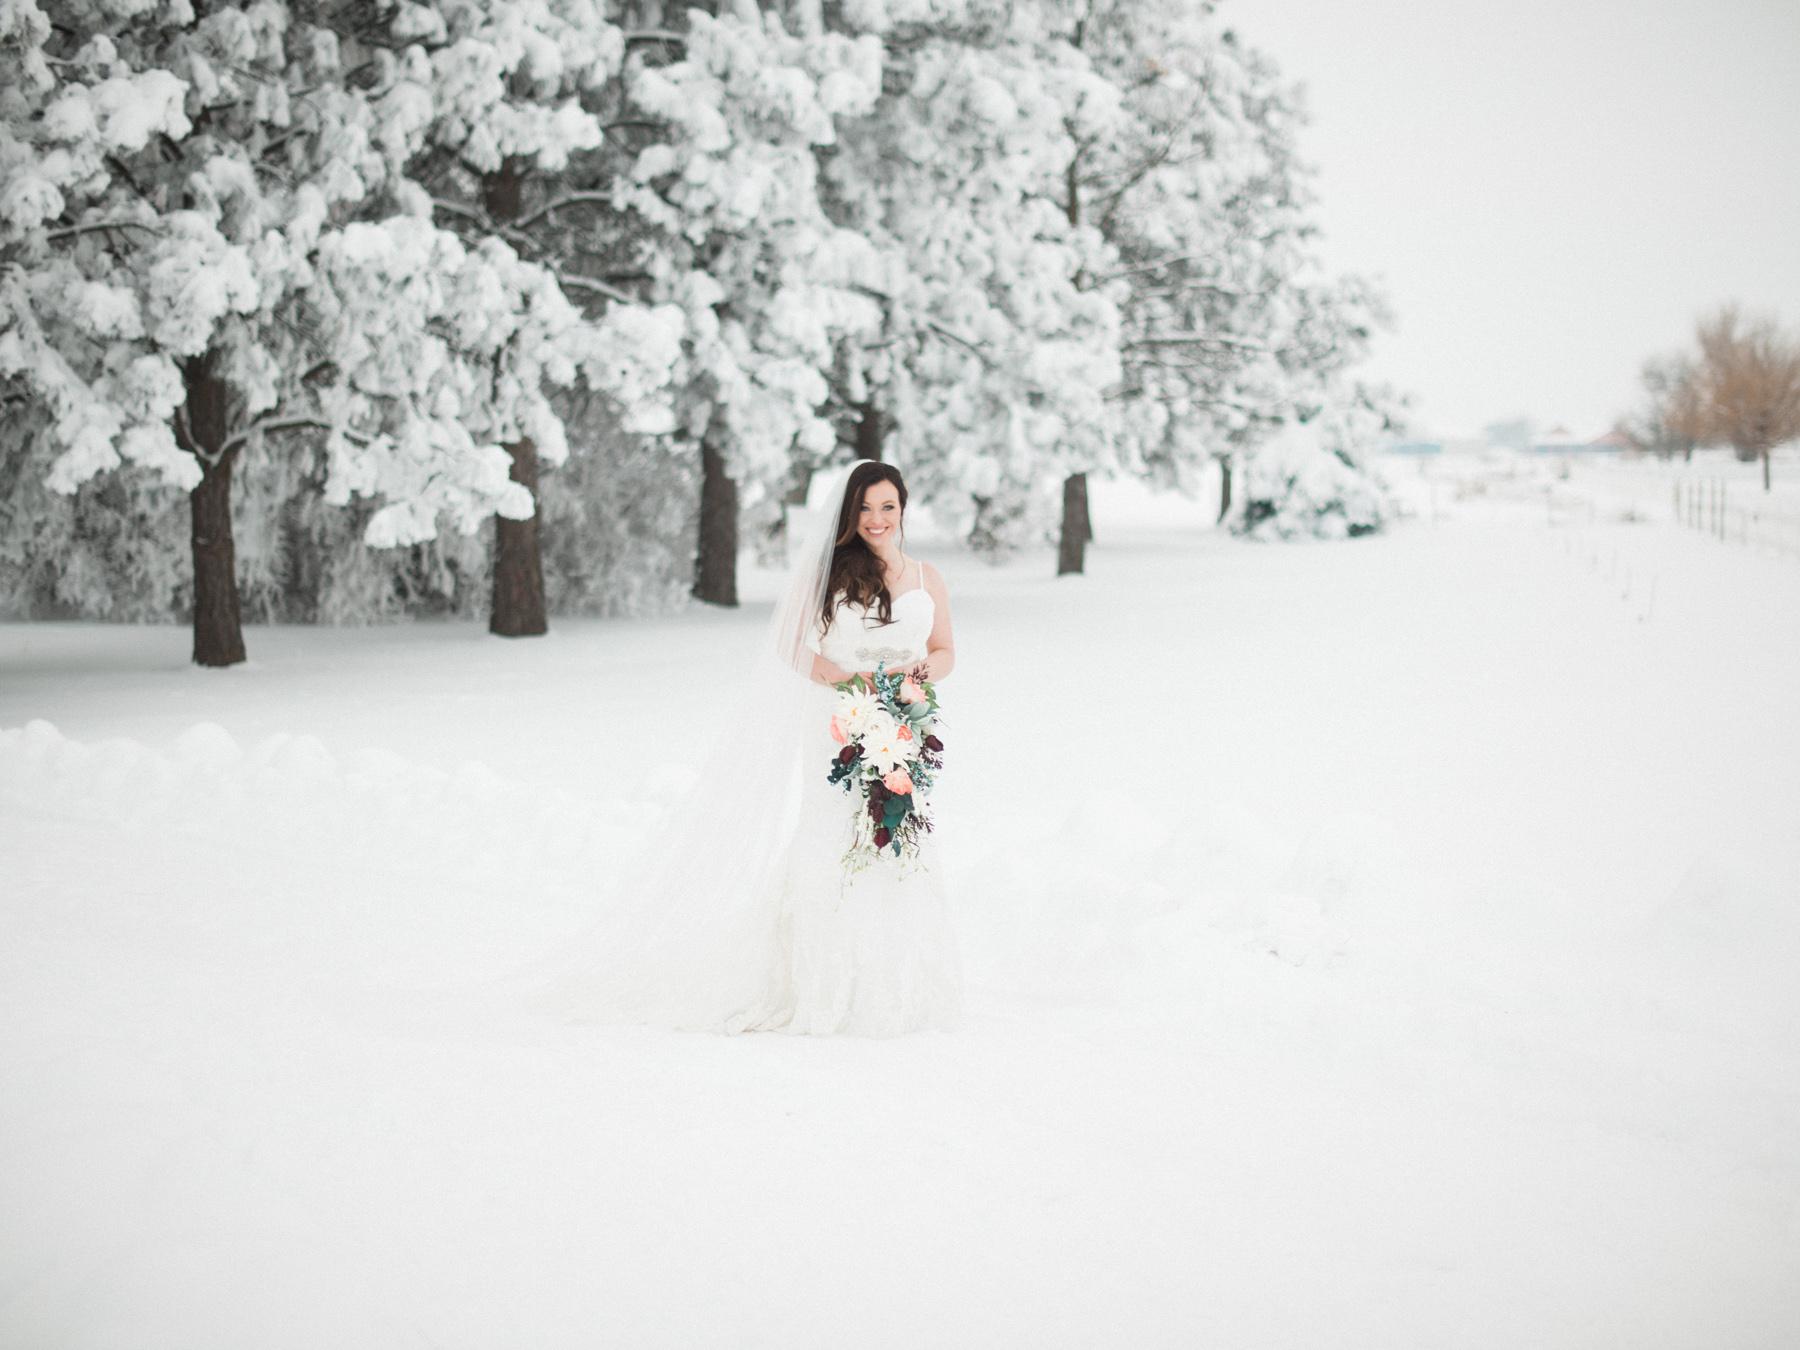 Ben+Joella | Jacob+Alana Wedding24.jpg